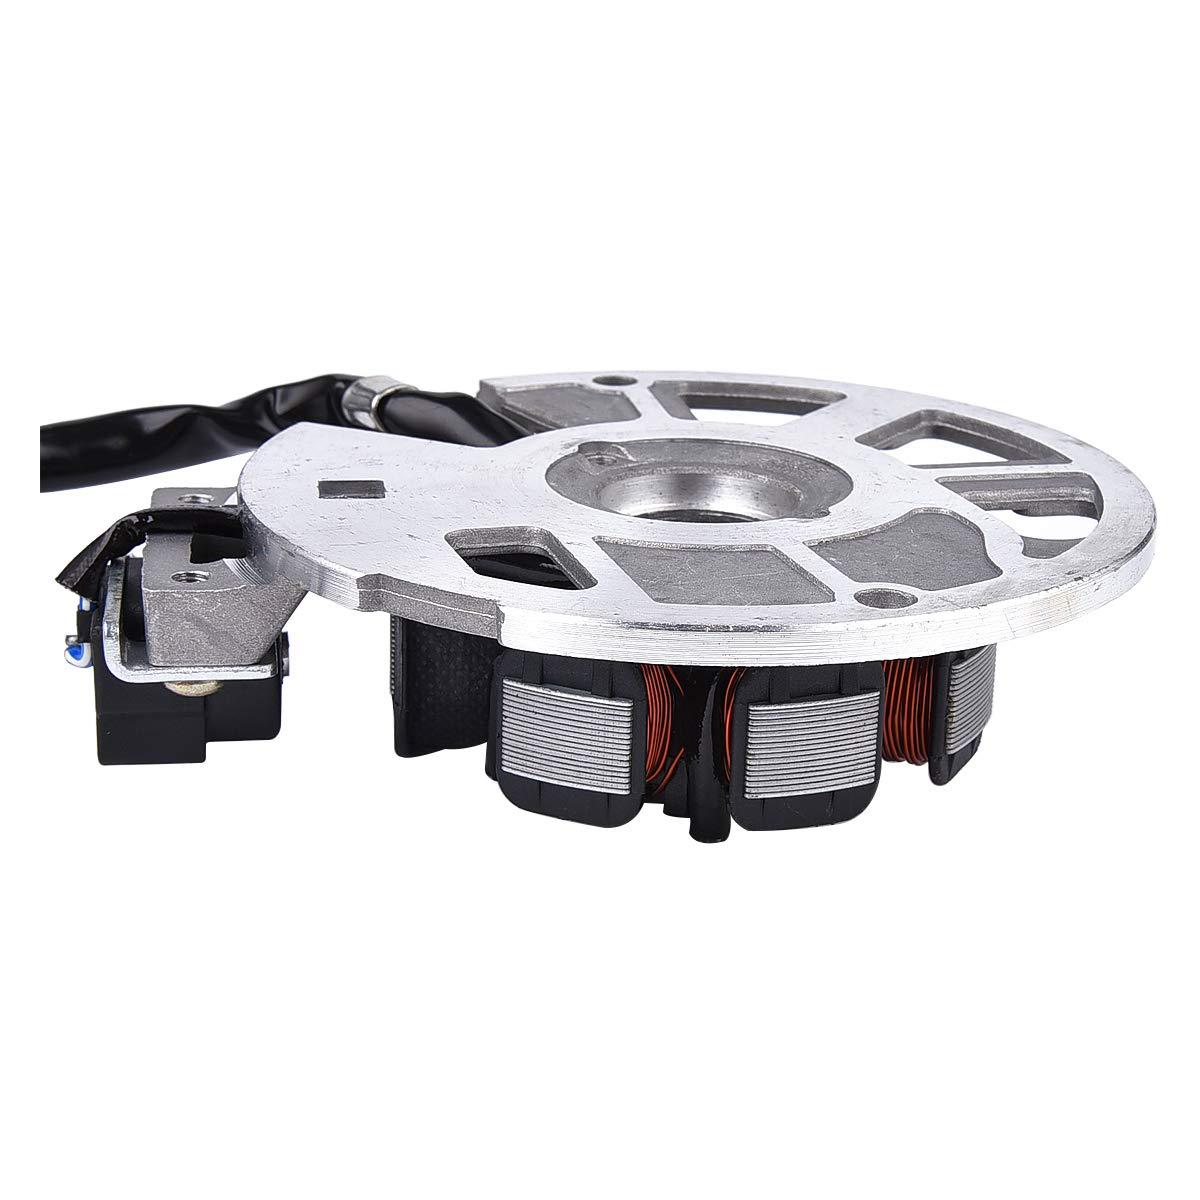 Wingsmoto G/én/érateur de magn/éto-statator # 650234 pour ATV Eton Viper 90 RXL-90R Sierra DXL90 AXL90